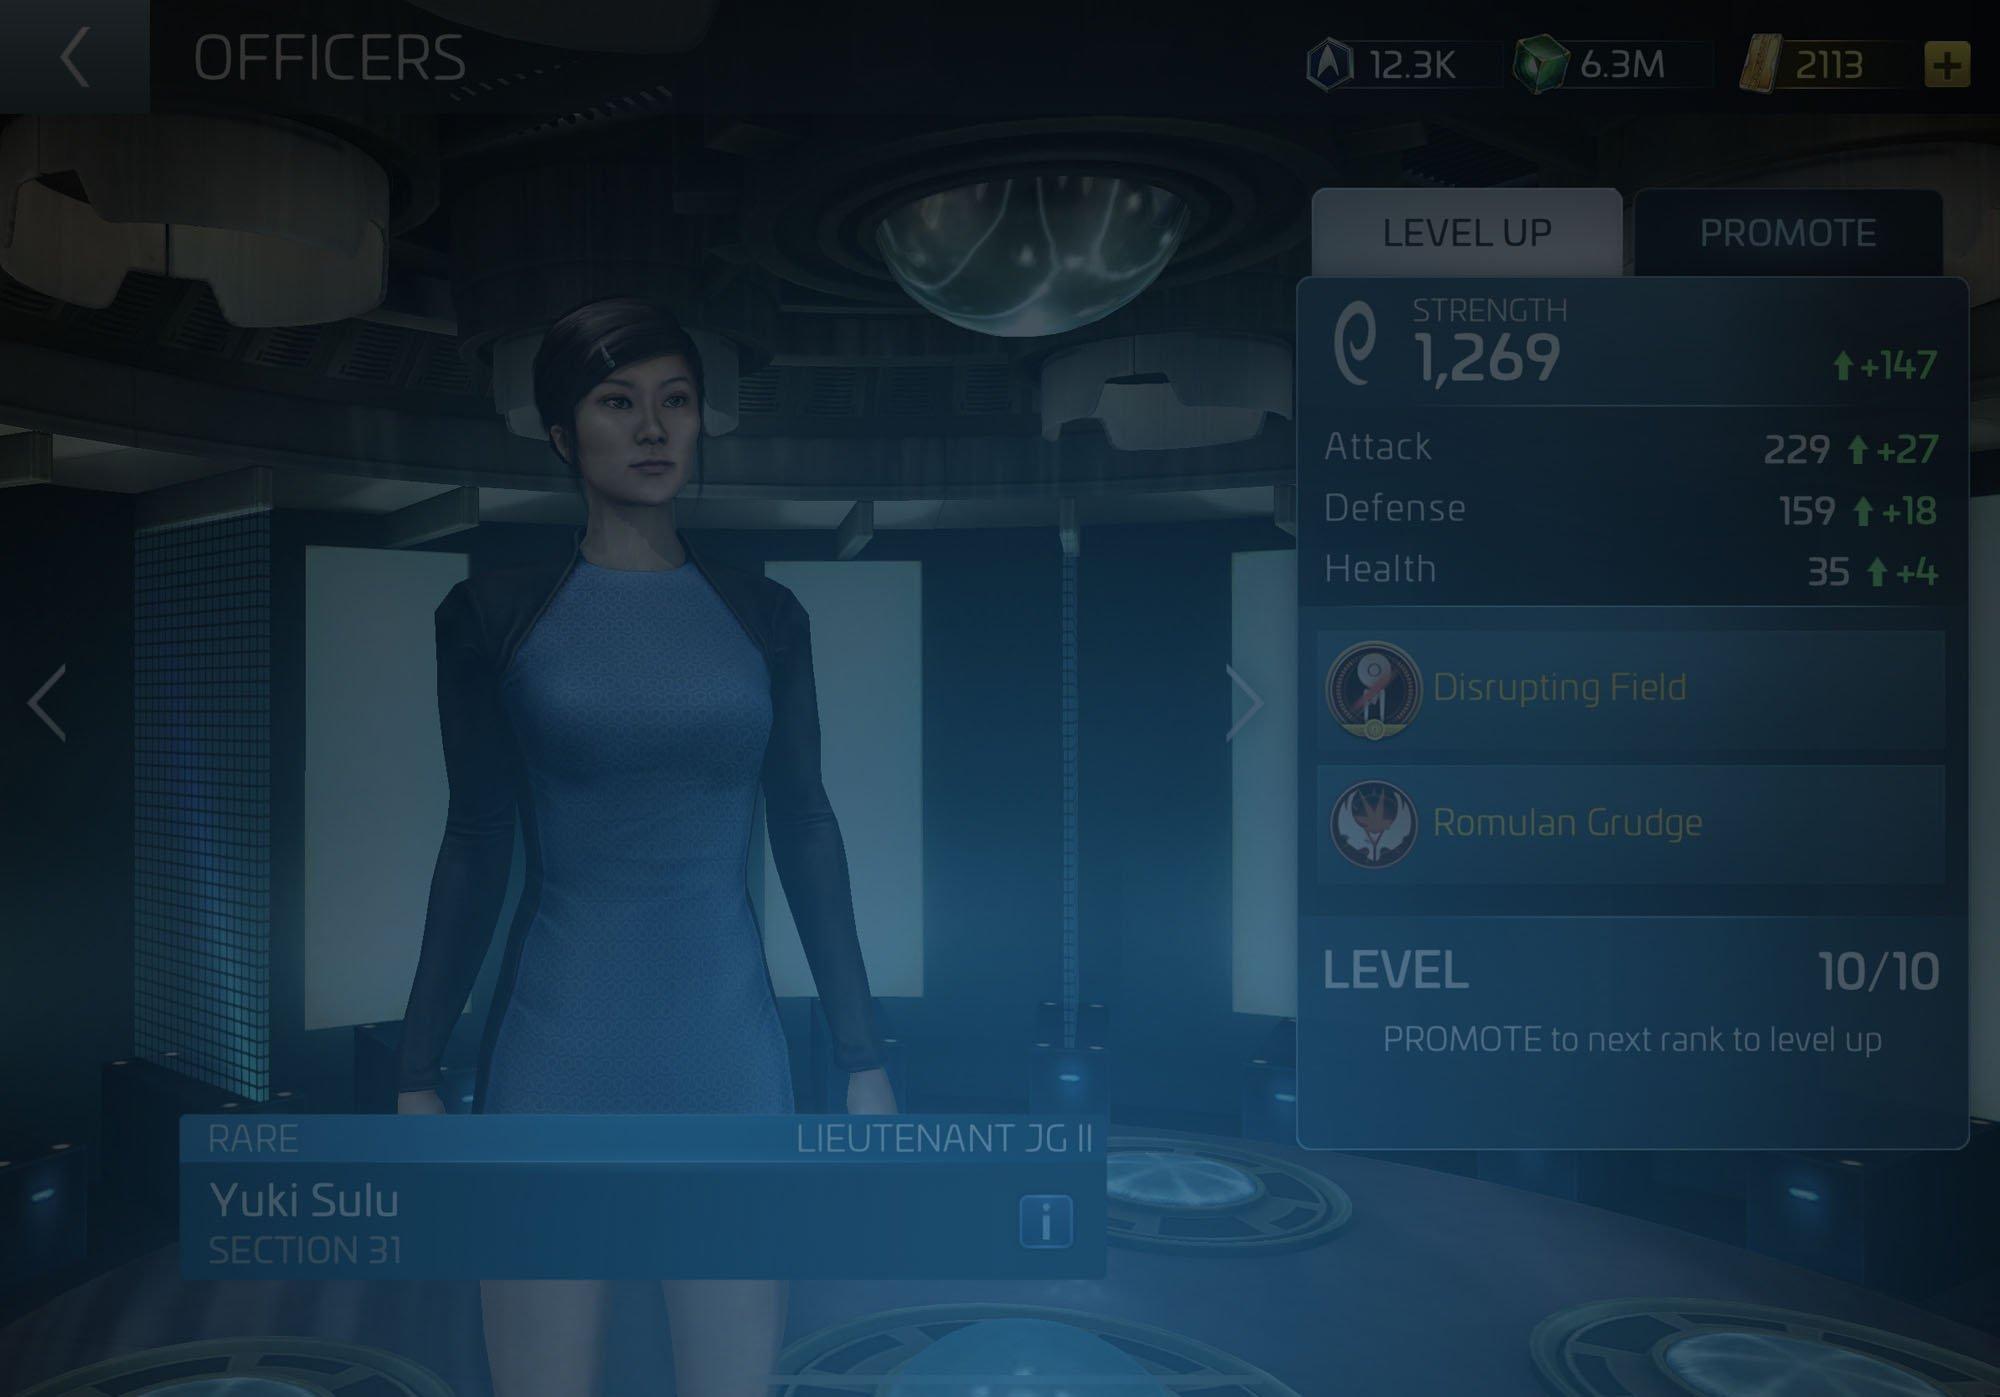 Officer Yuki Sulu